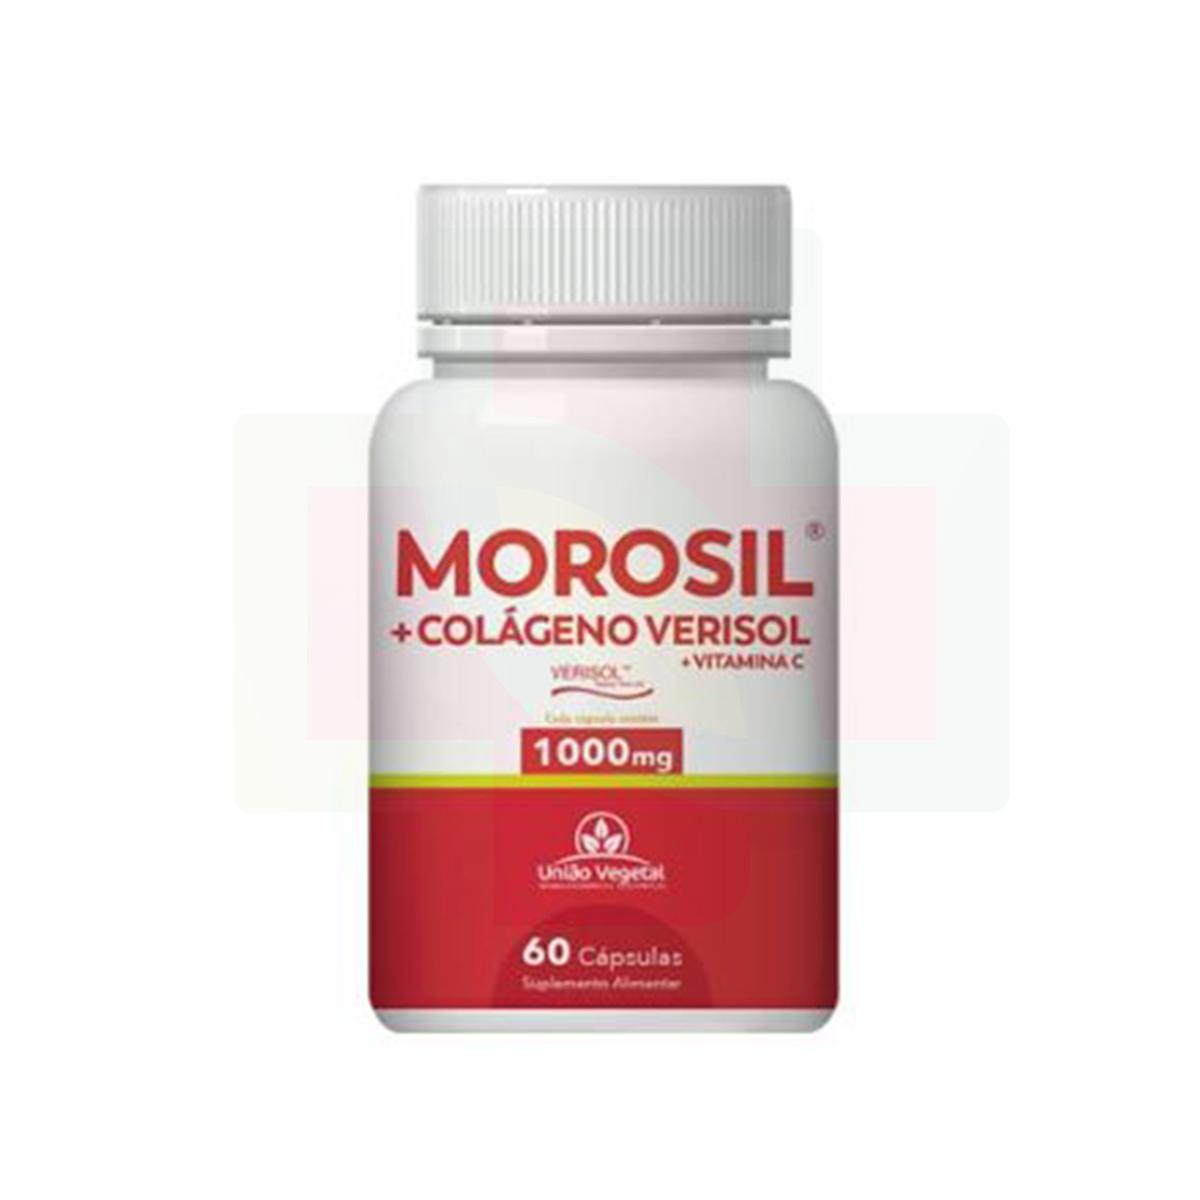 MOROSIL + COLÁGENO VERISOL 60 CAPS - UNIAO VEGETAL